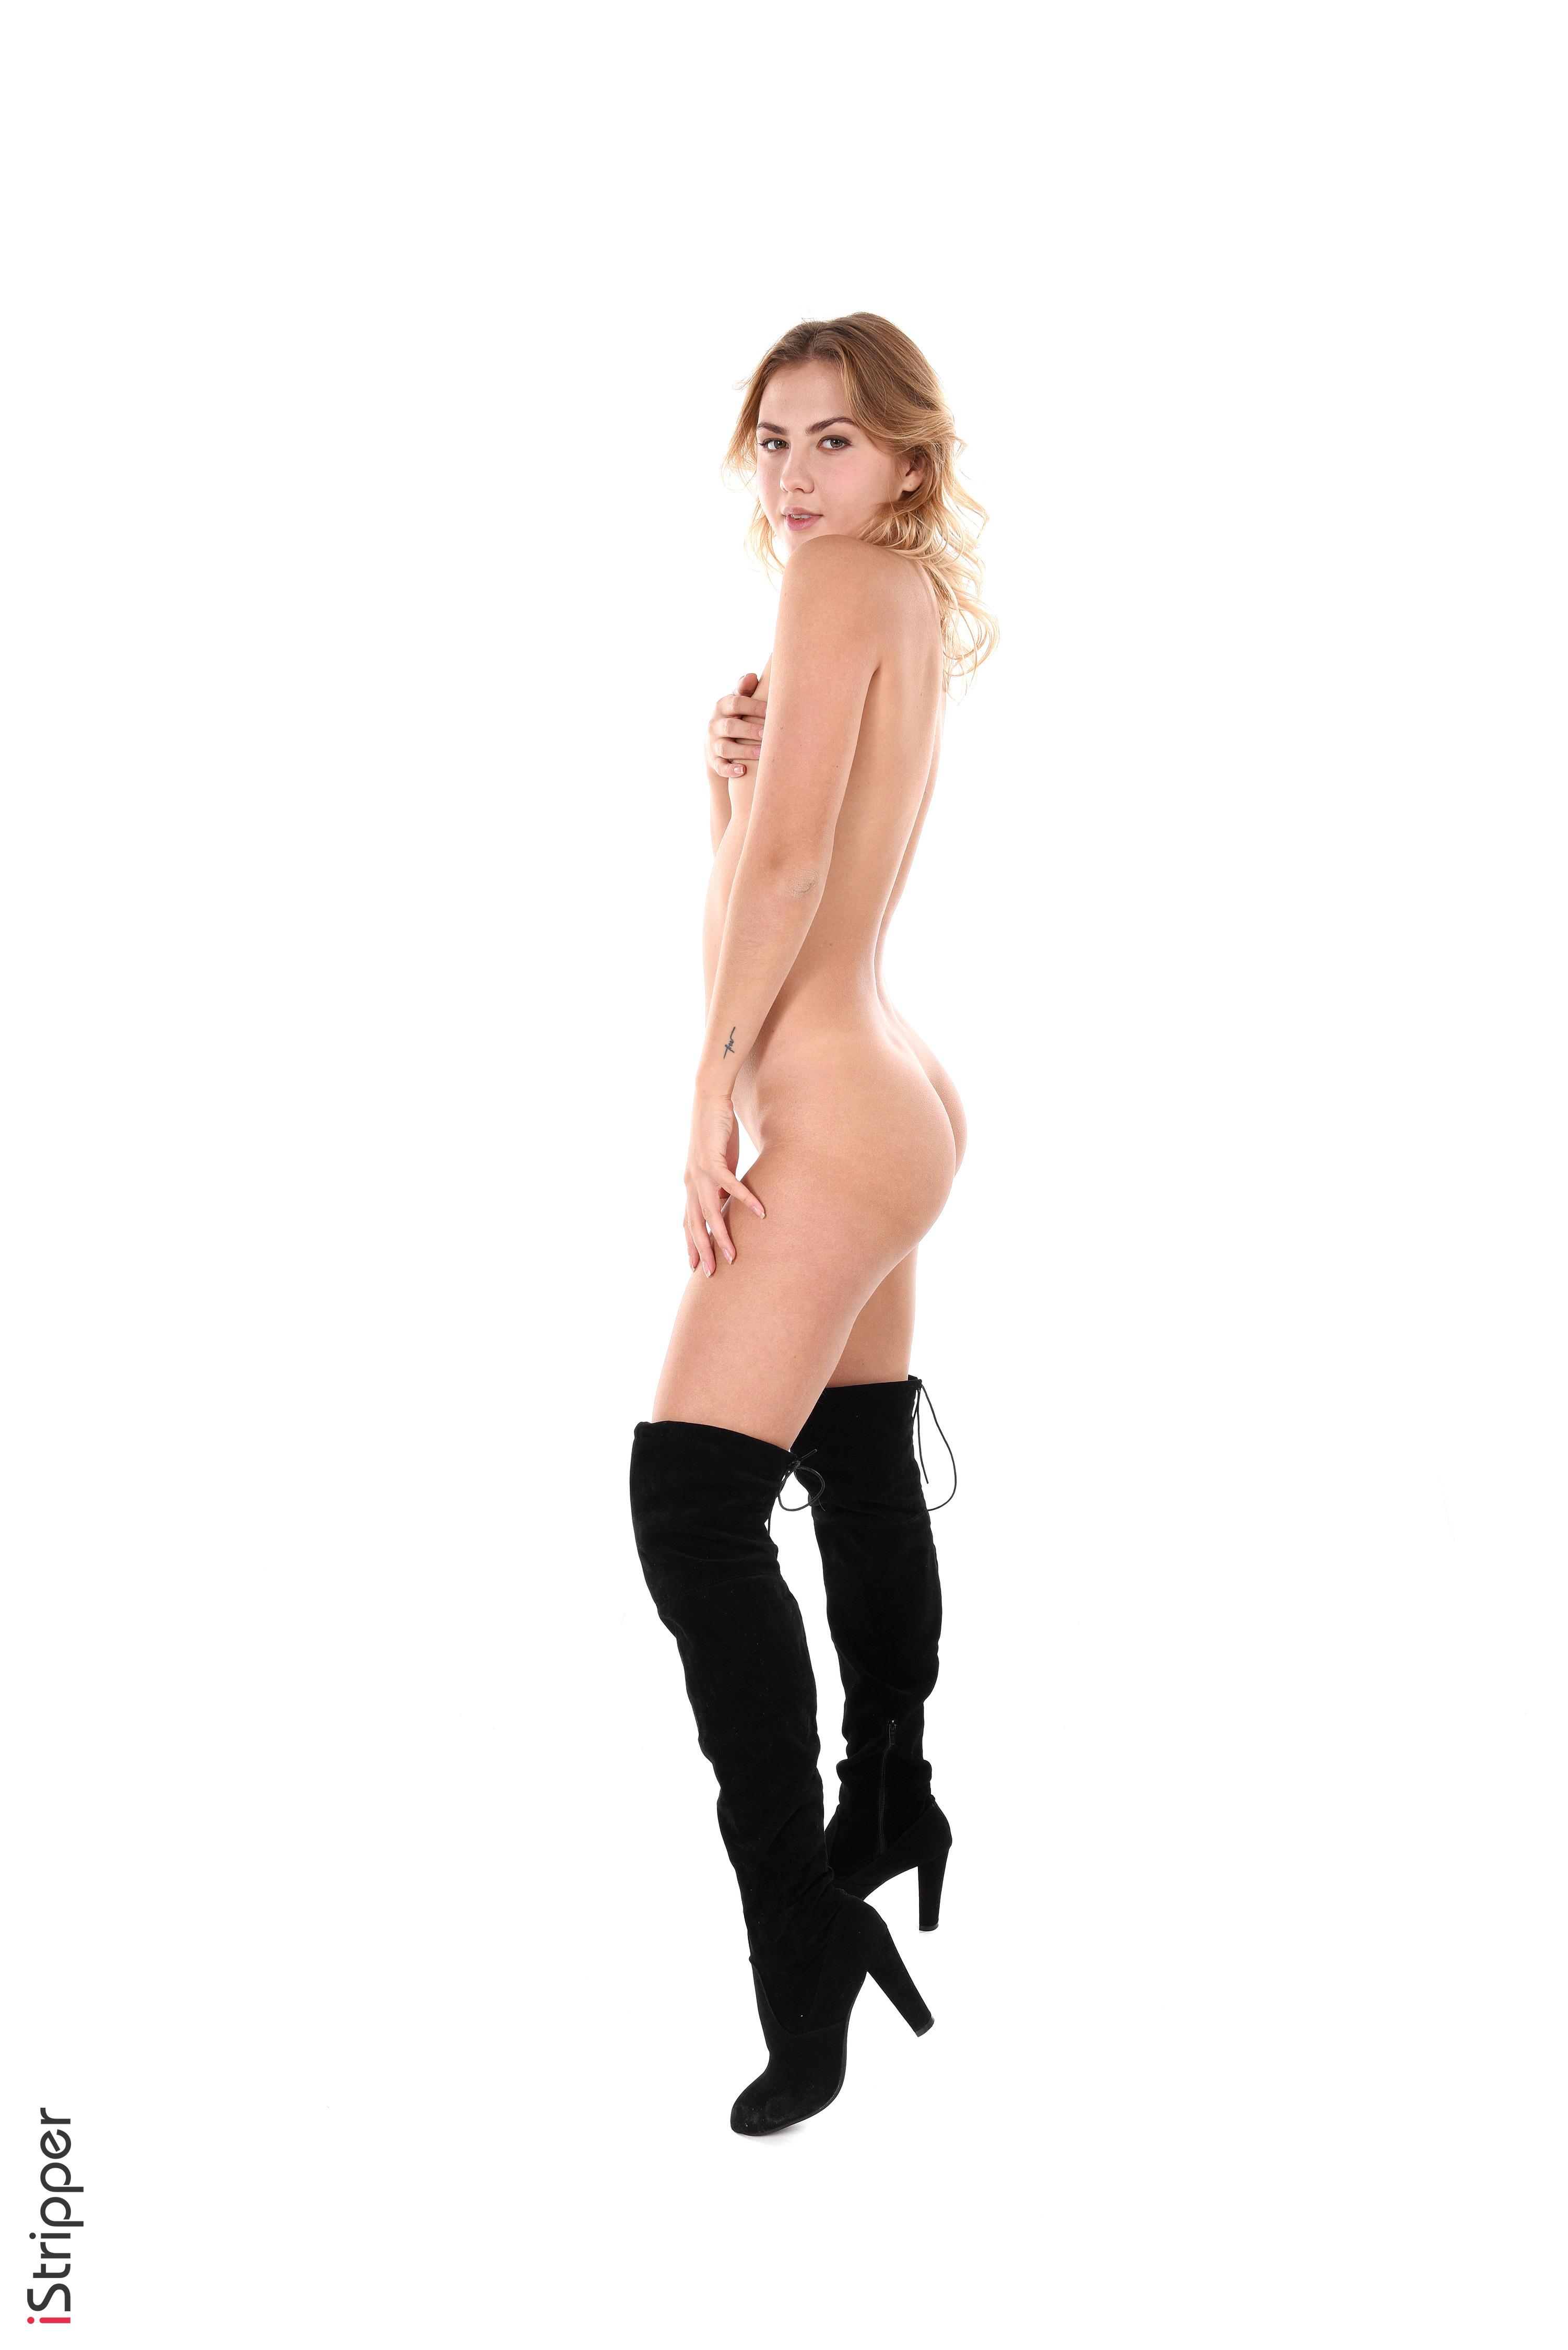 kaley sexy football striptease nude